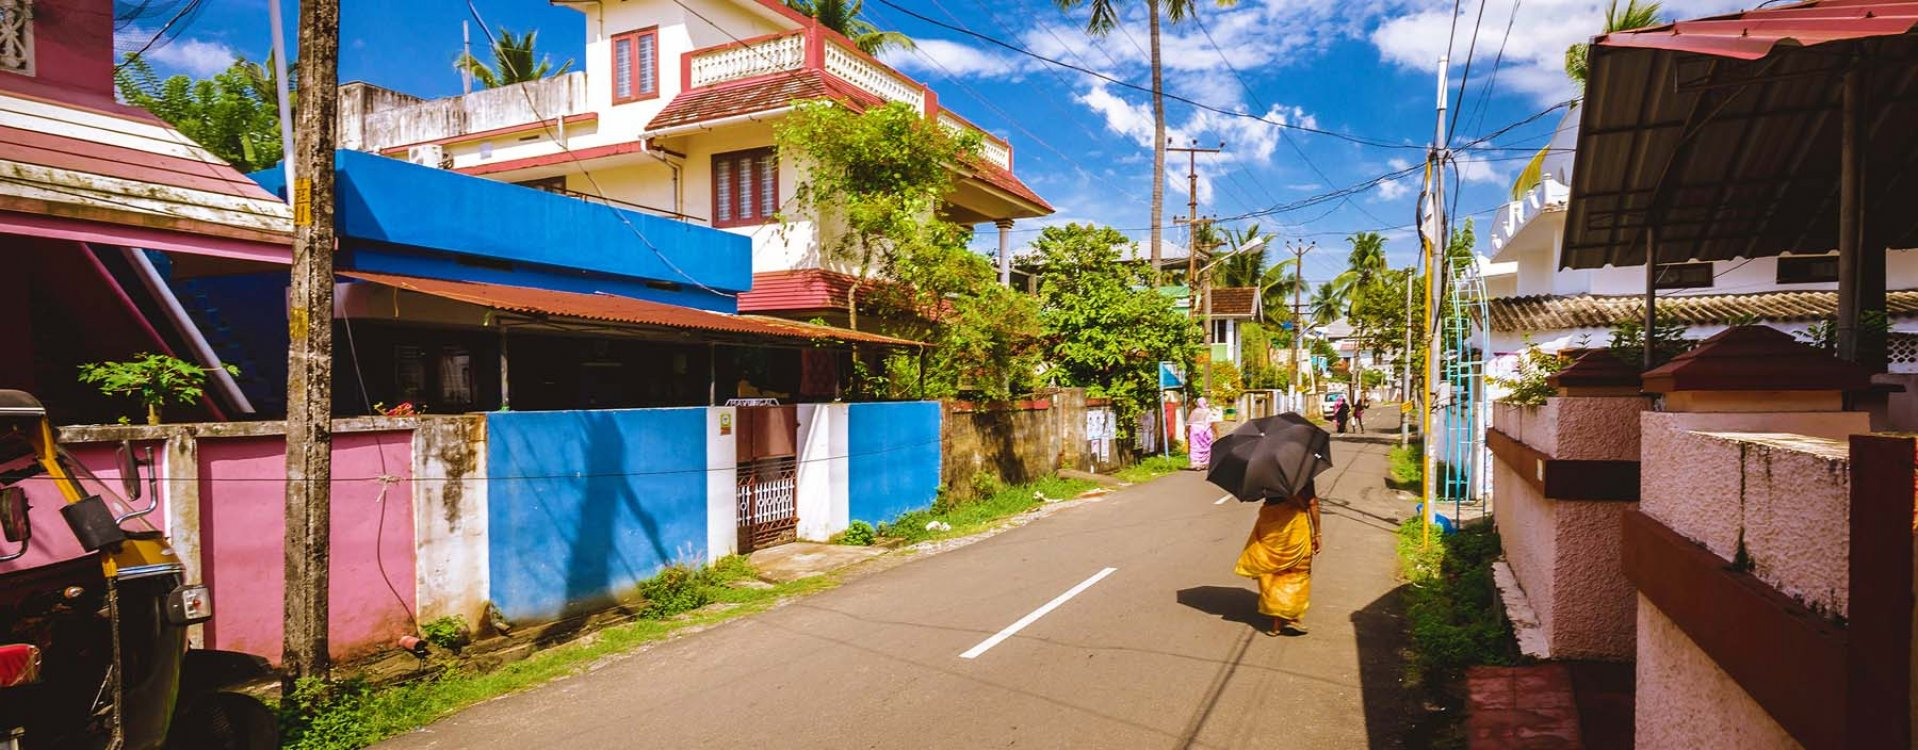 Cochin, straatbeeld